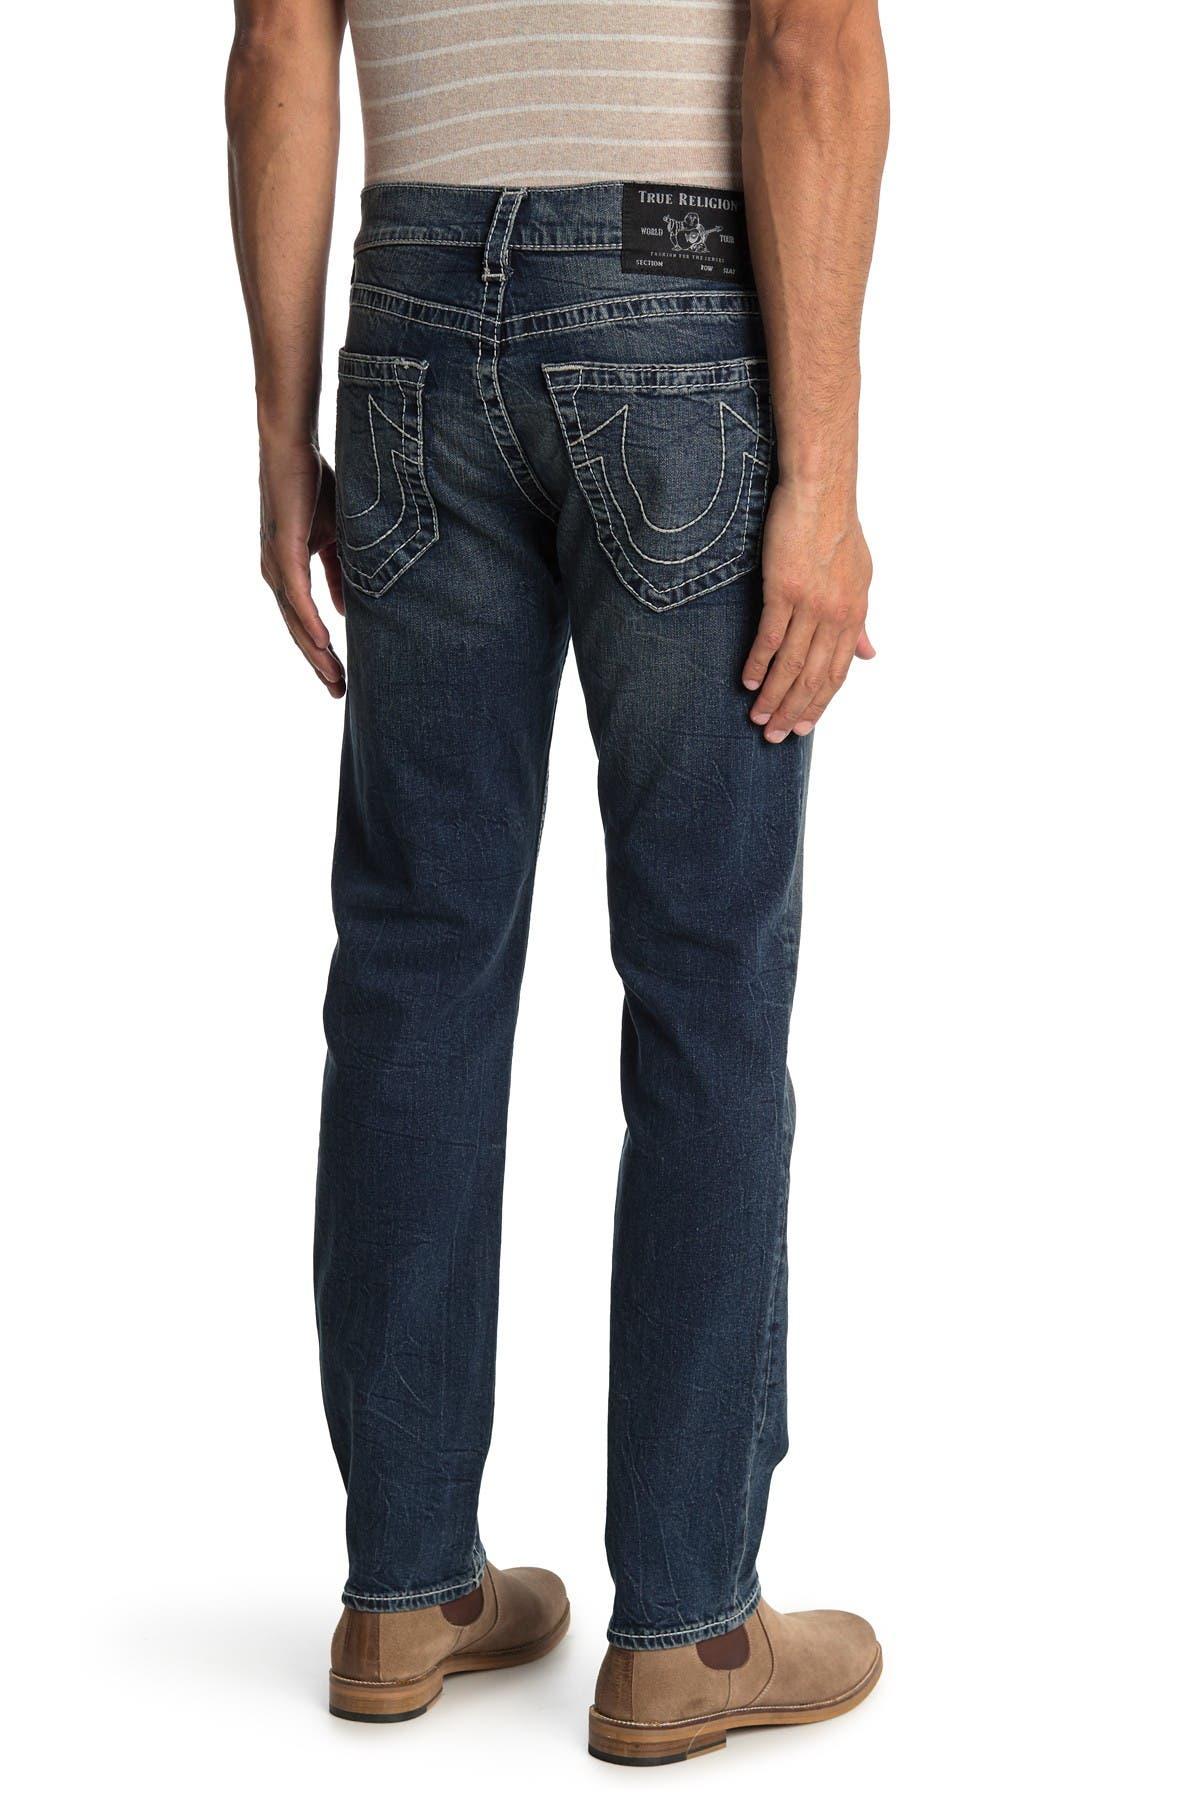 Image of True Religion Geno Slim Fit Jeans